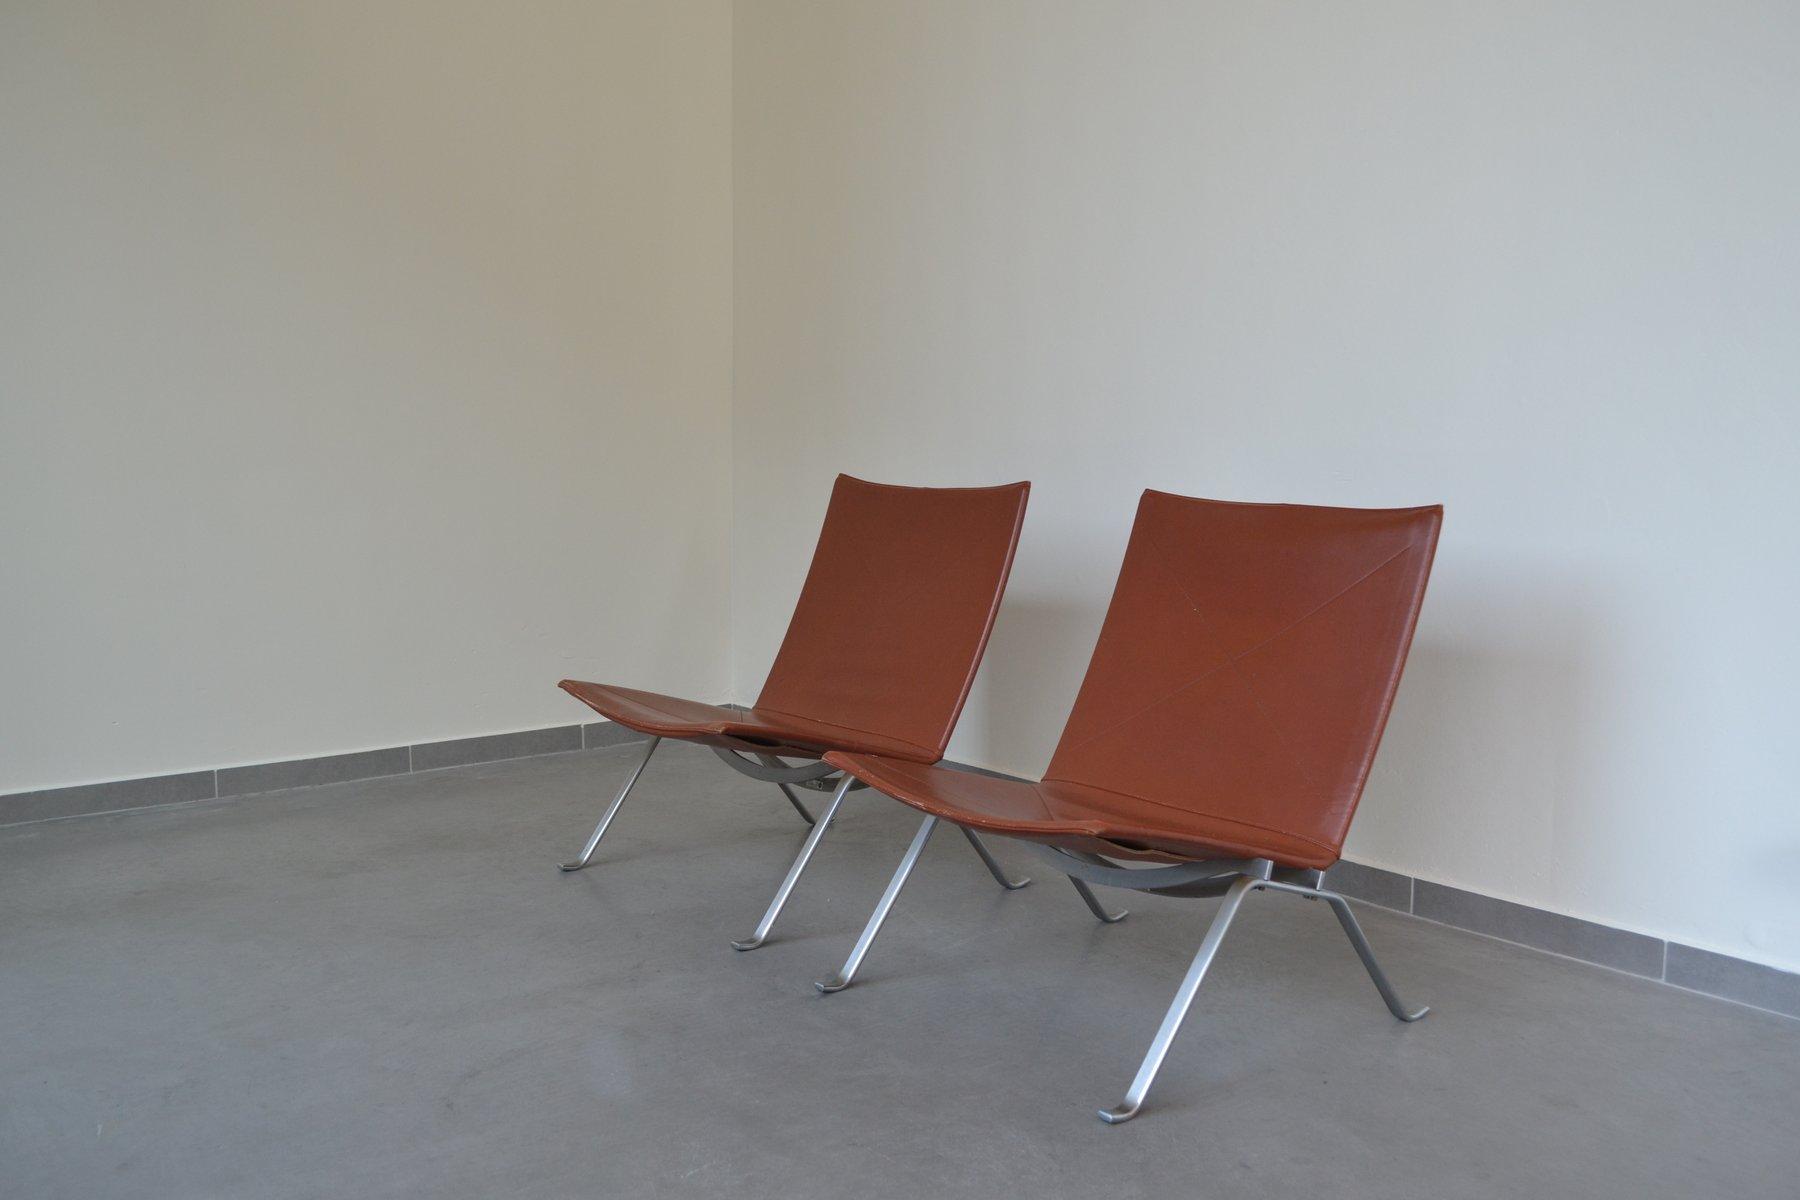 pk22 st hle von poul kjaerholm f r fritz hansen 1989 bei. Black Bedroom Furniture Sets. Home Design Ideas